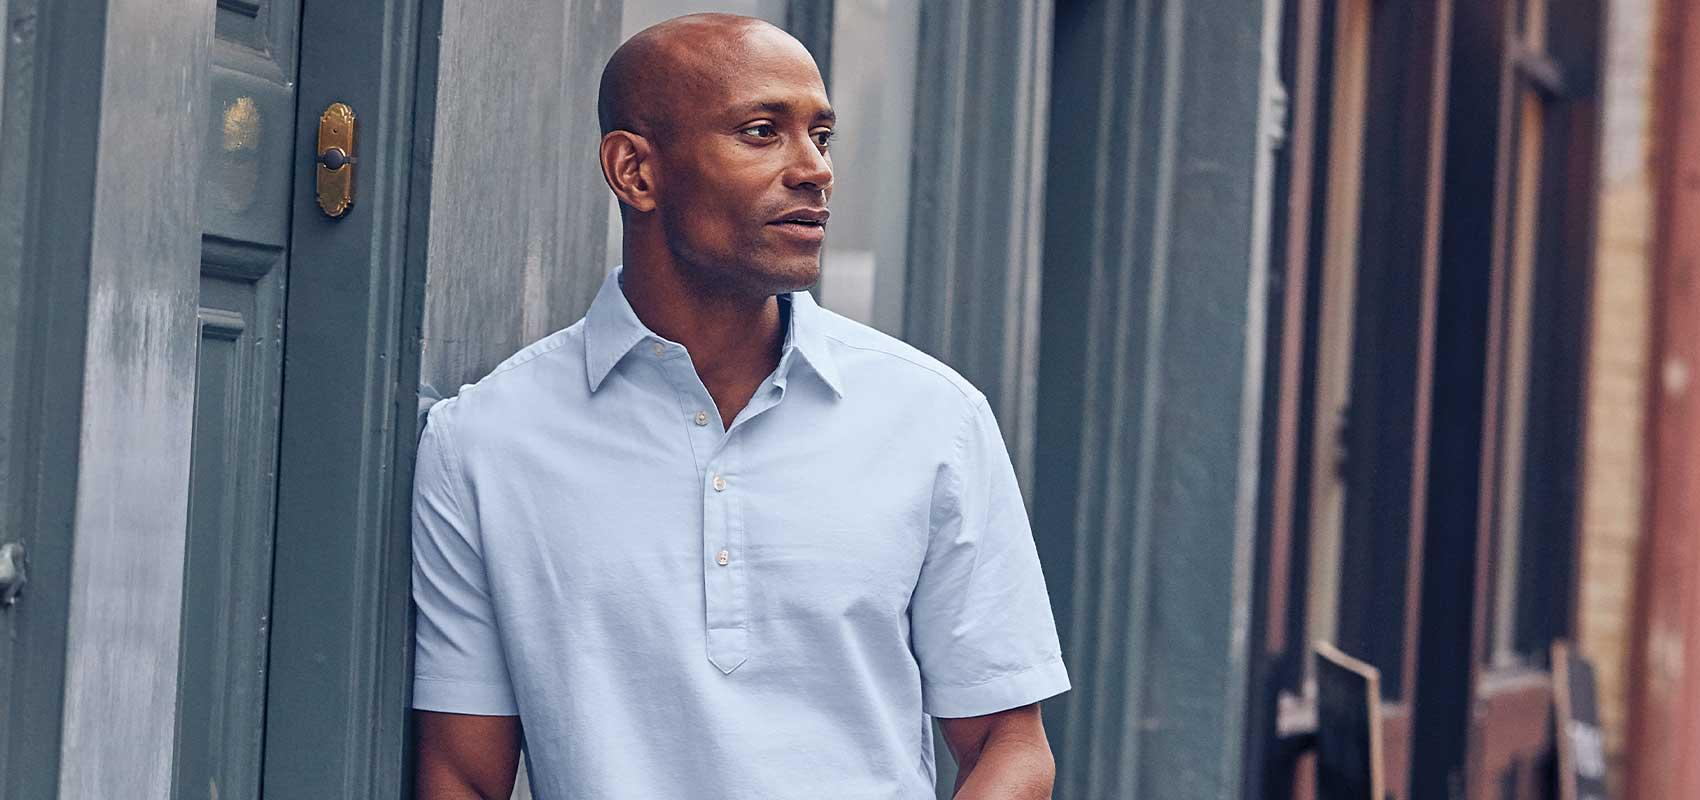 Charles Tyrwhitt Polo Shirts